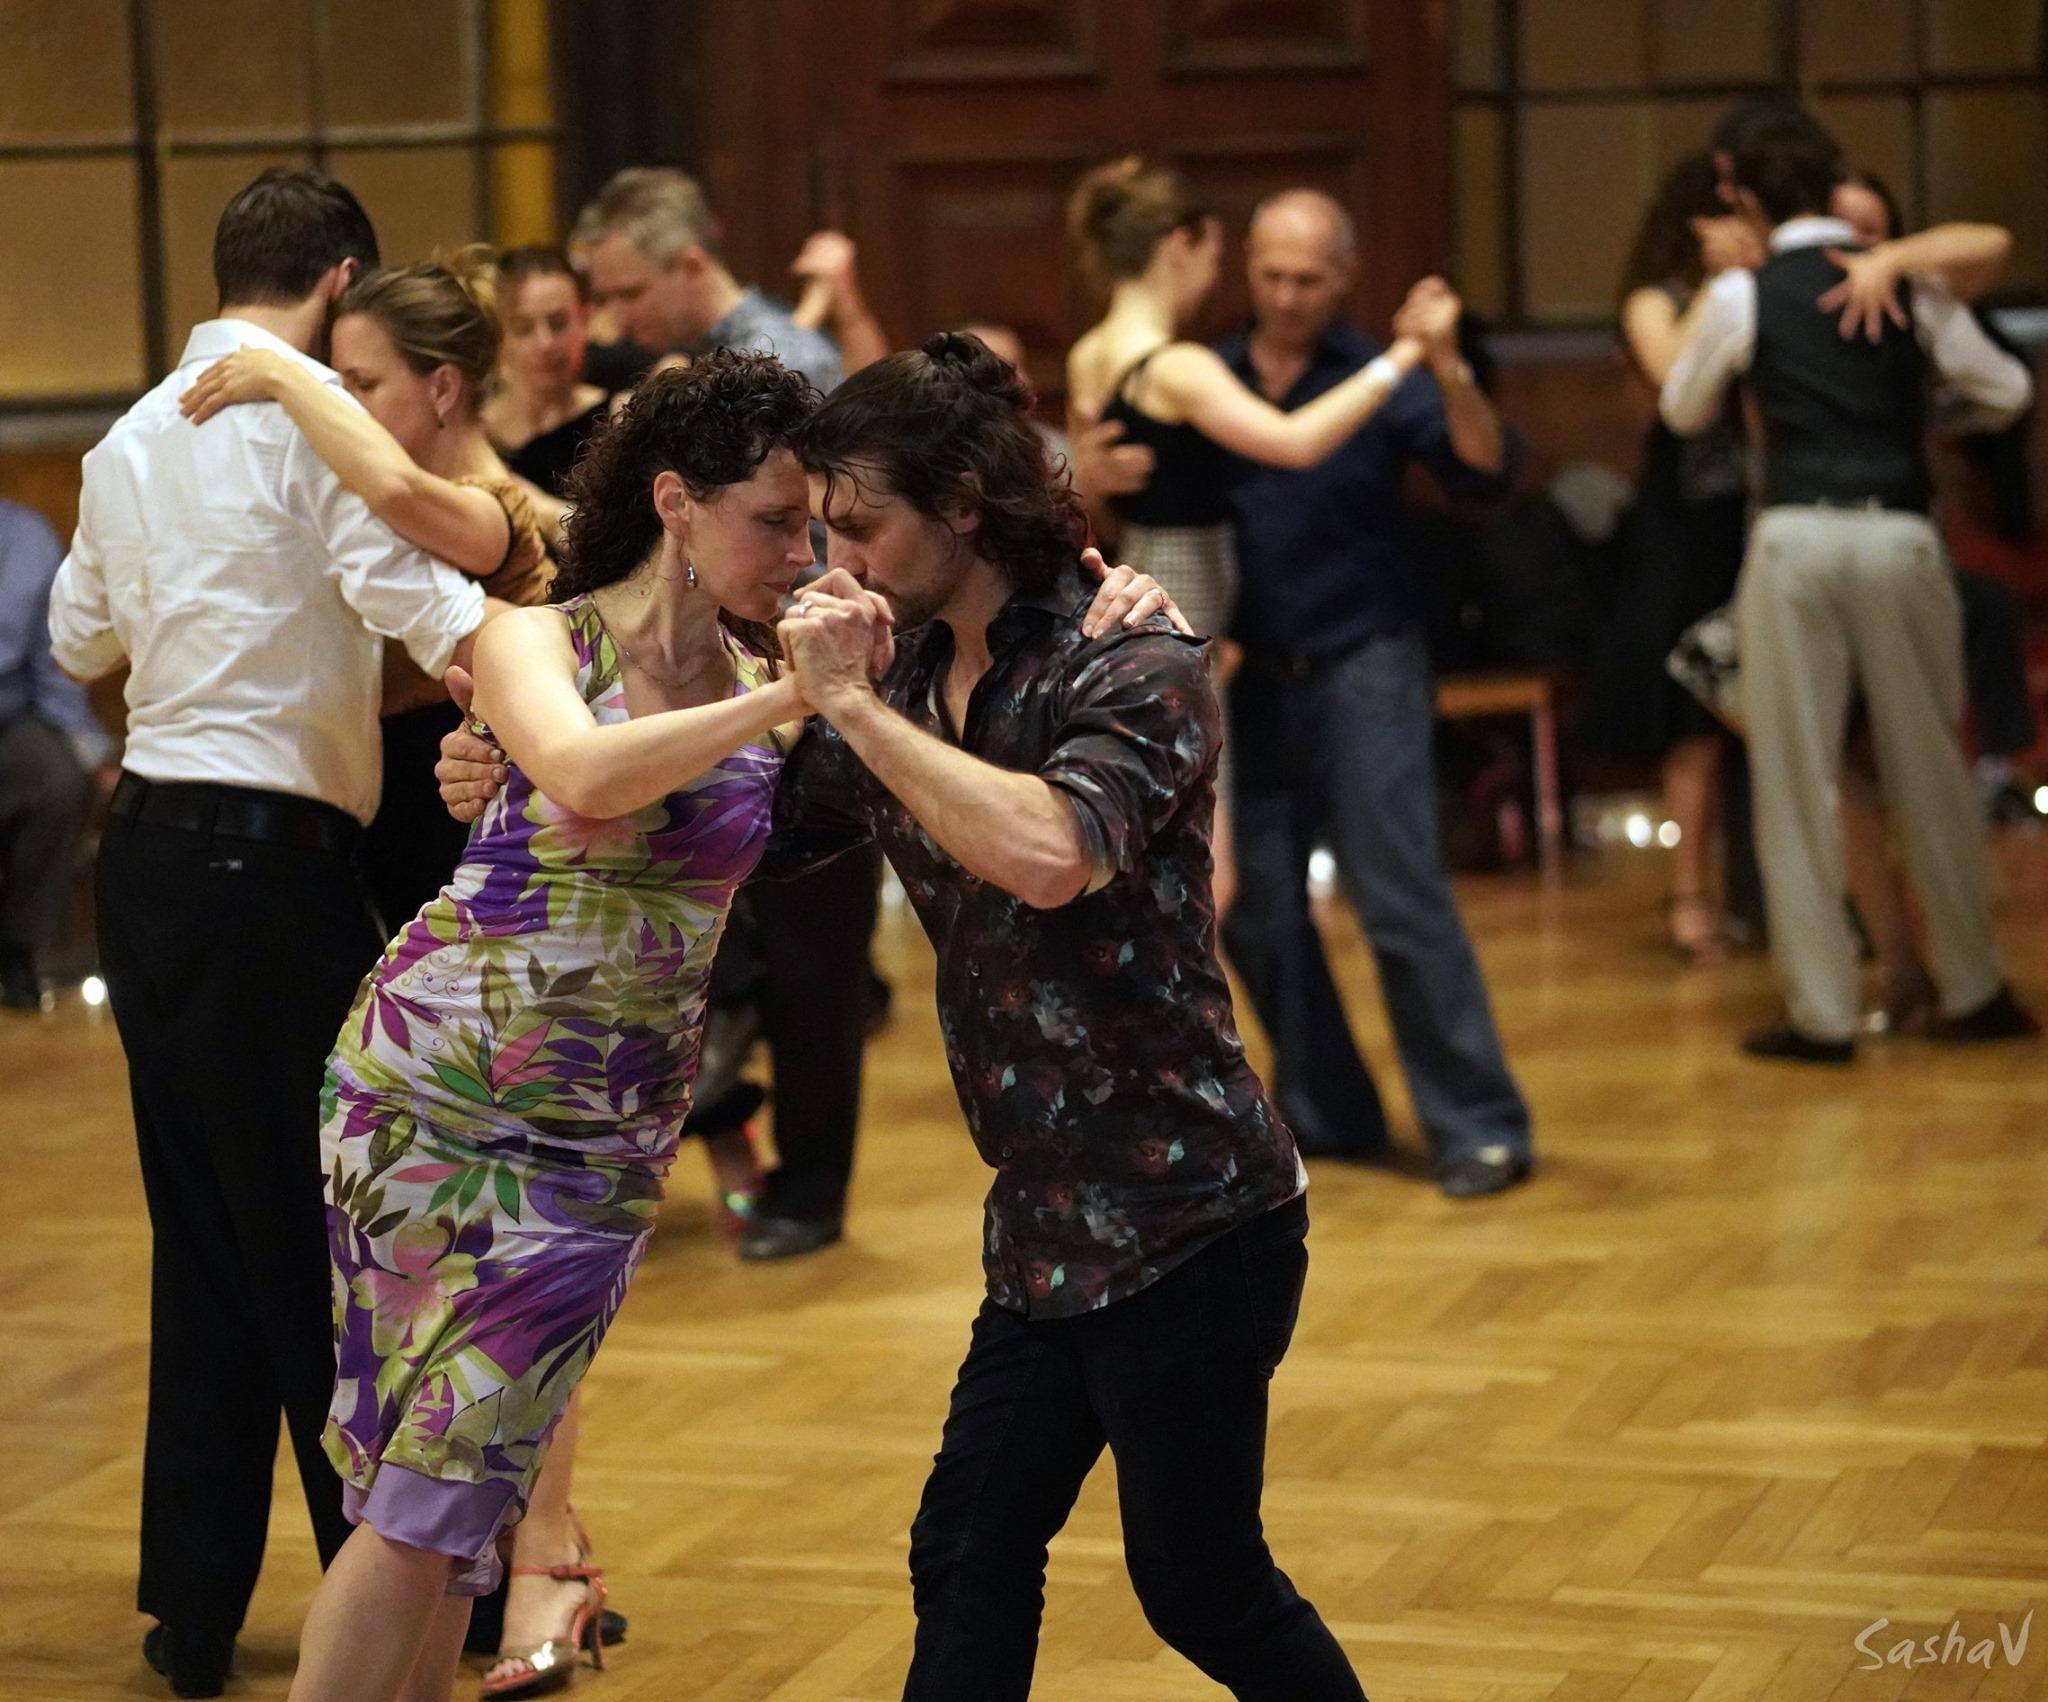 Sigrid Van Tilbeurgh + Yanick Wyler Tango dance Tic-Tac-Tango-Time 2020